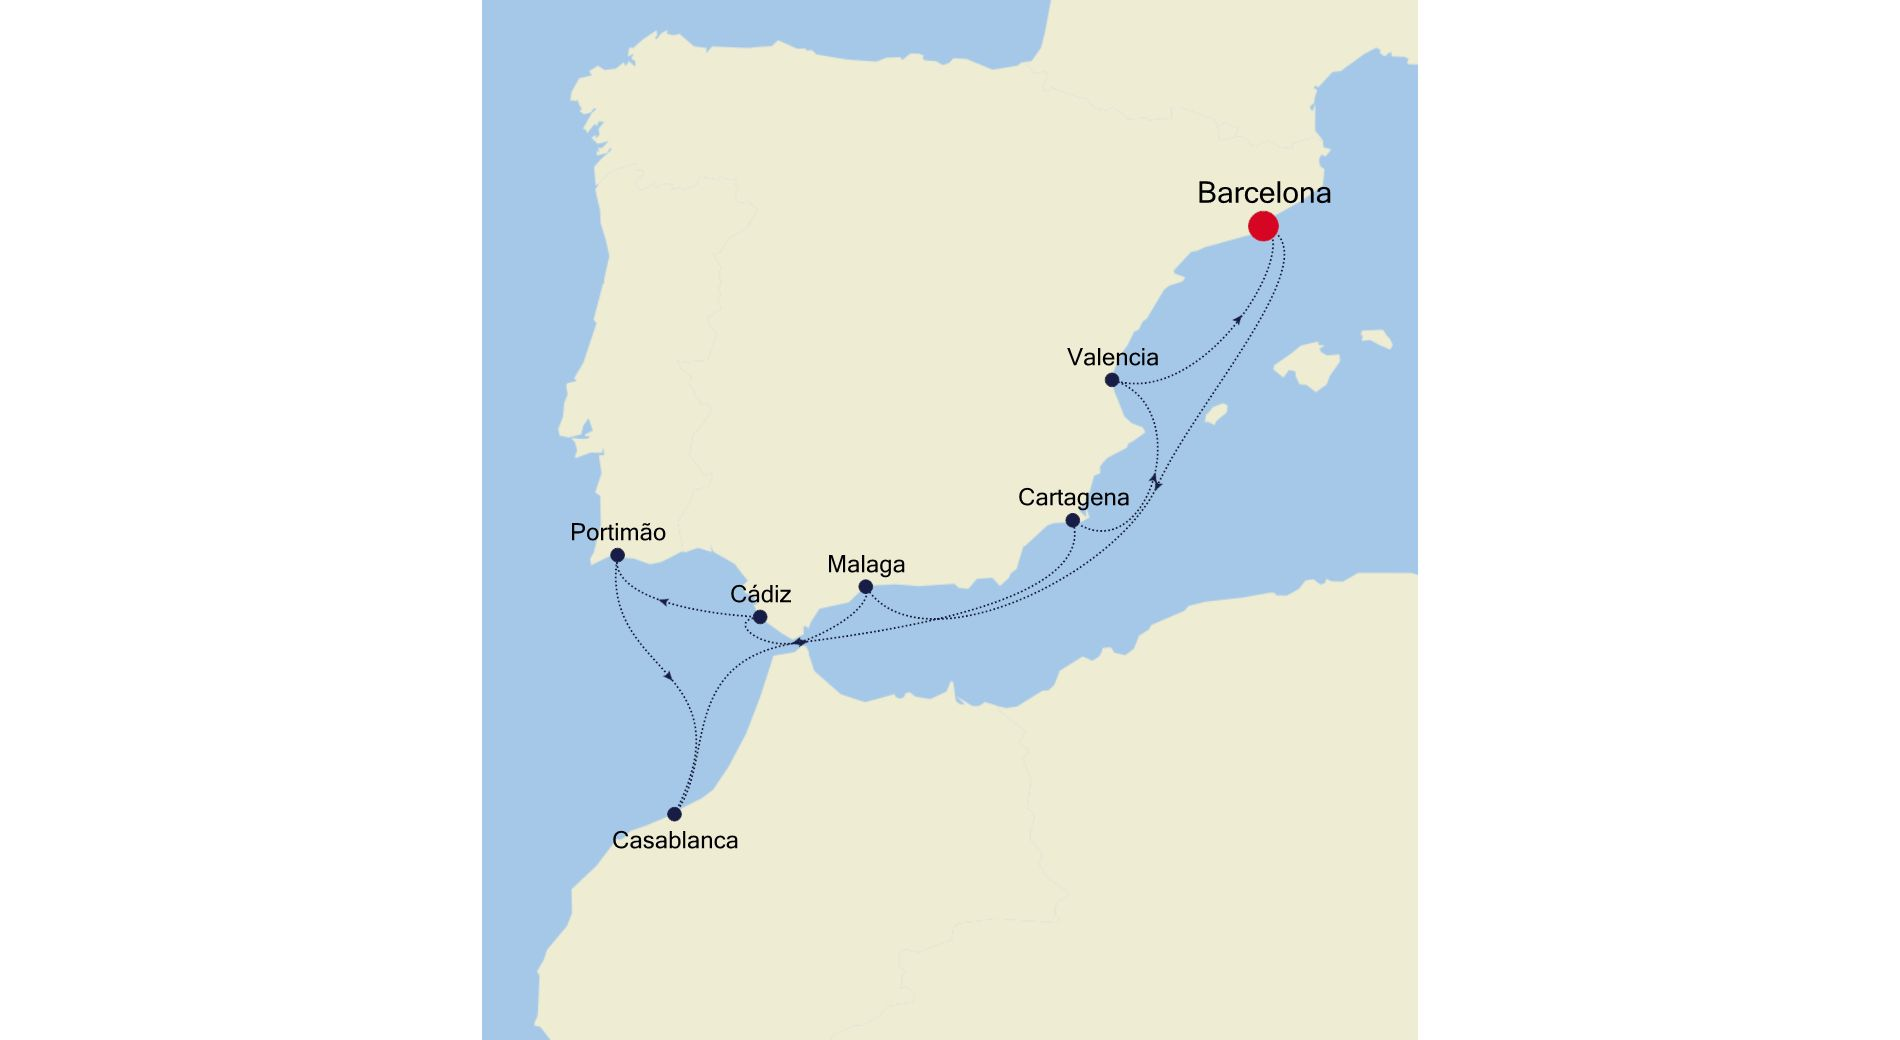 SS200914010 - Barcelona to Barcelona